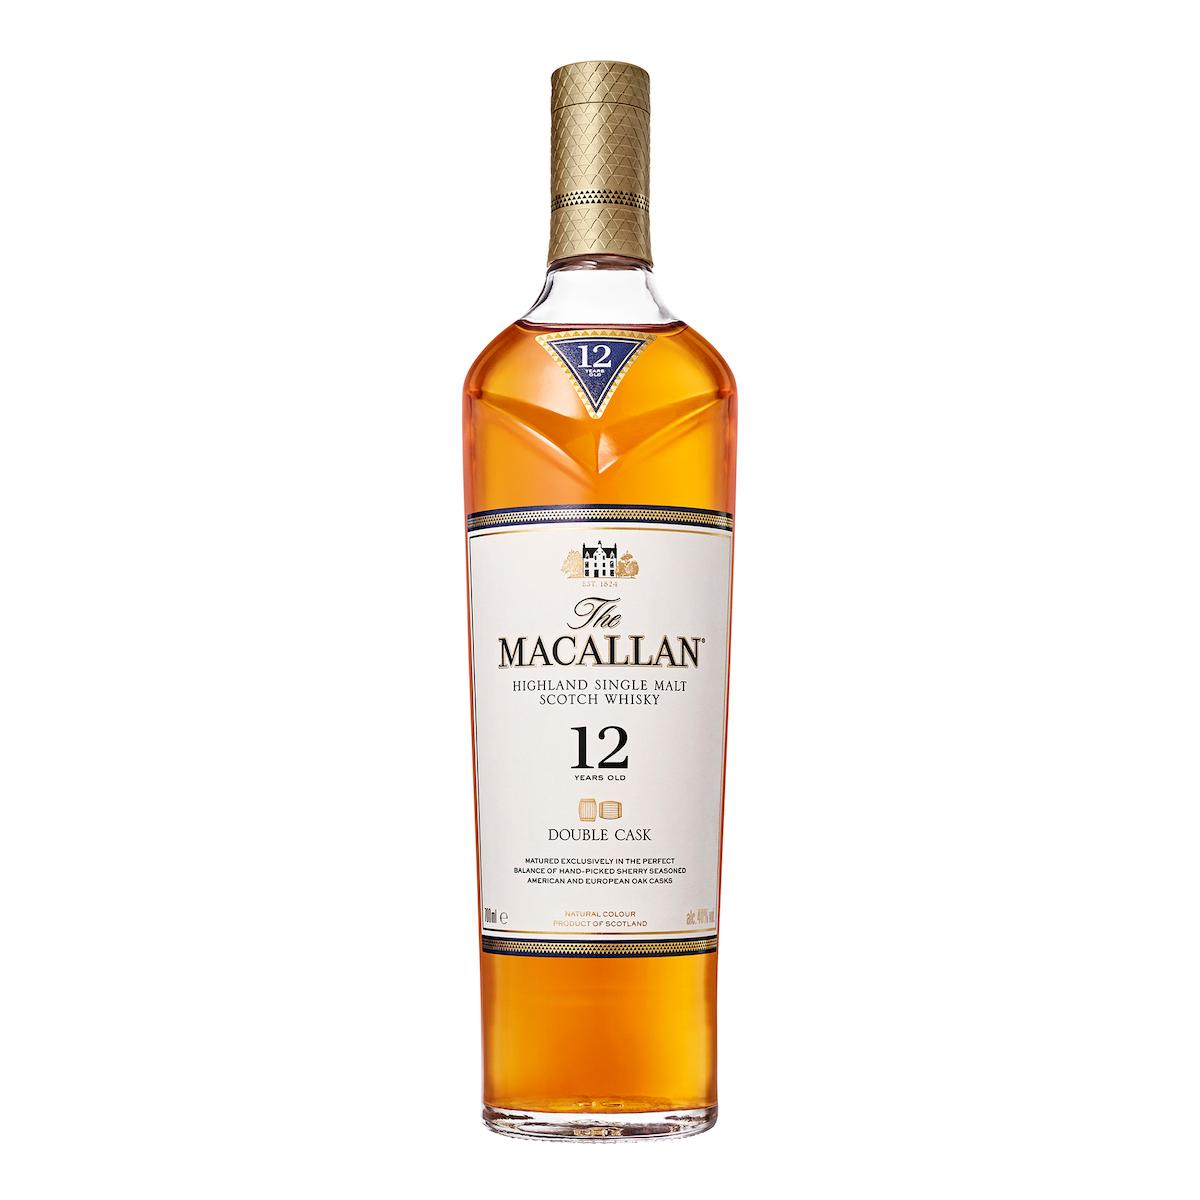 the macallan double cask 12 year old single malt scotch whisky 700ml